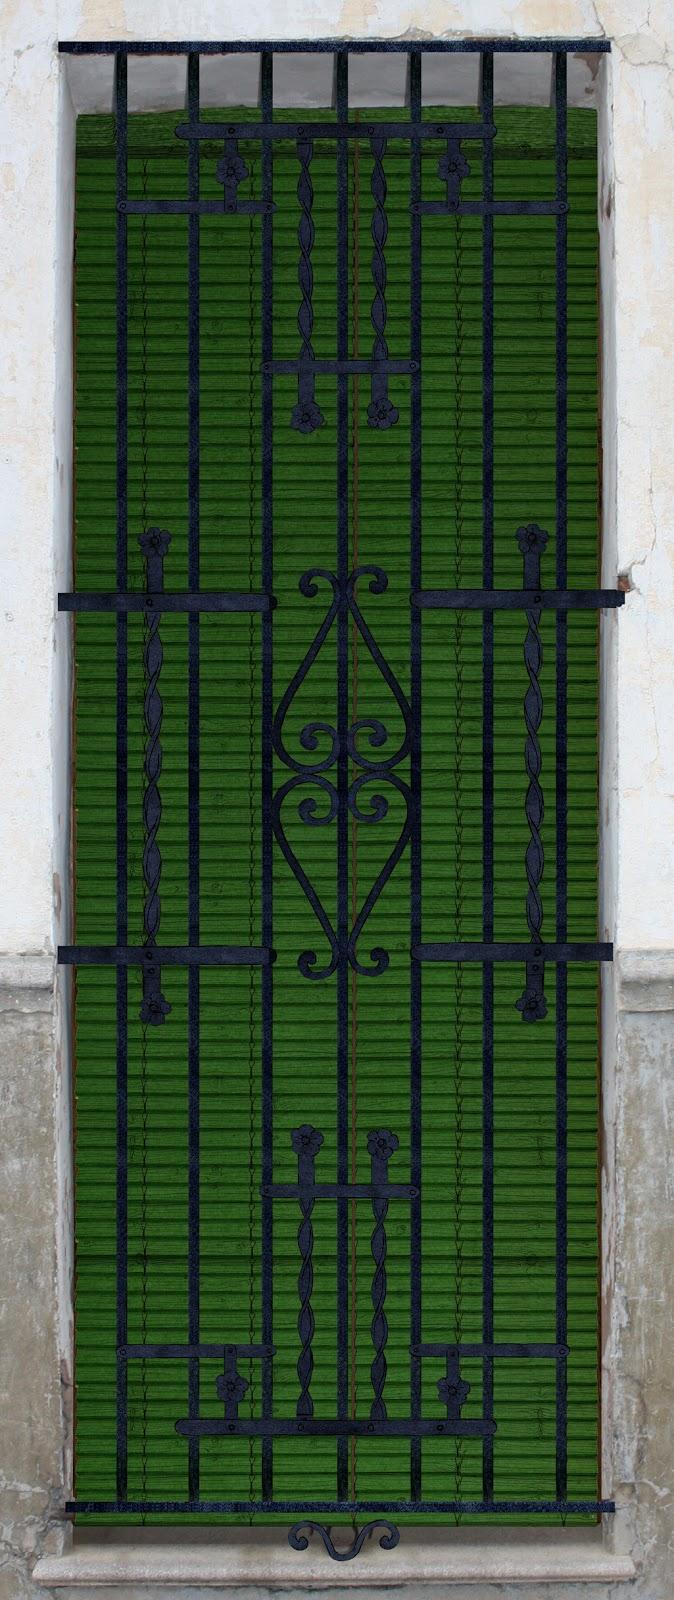 ventana, reja,  persiana